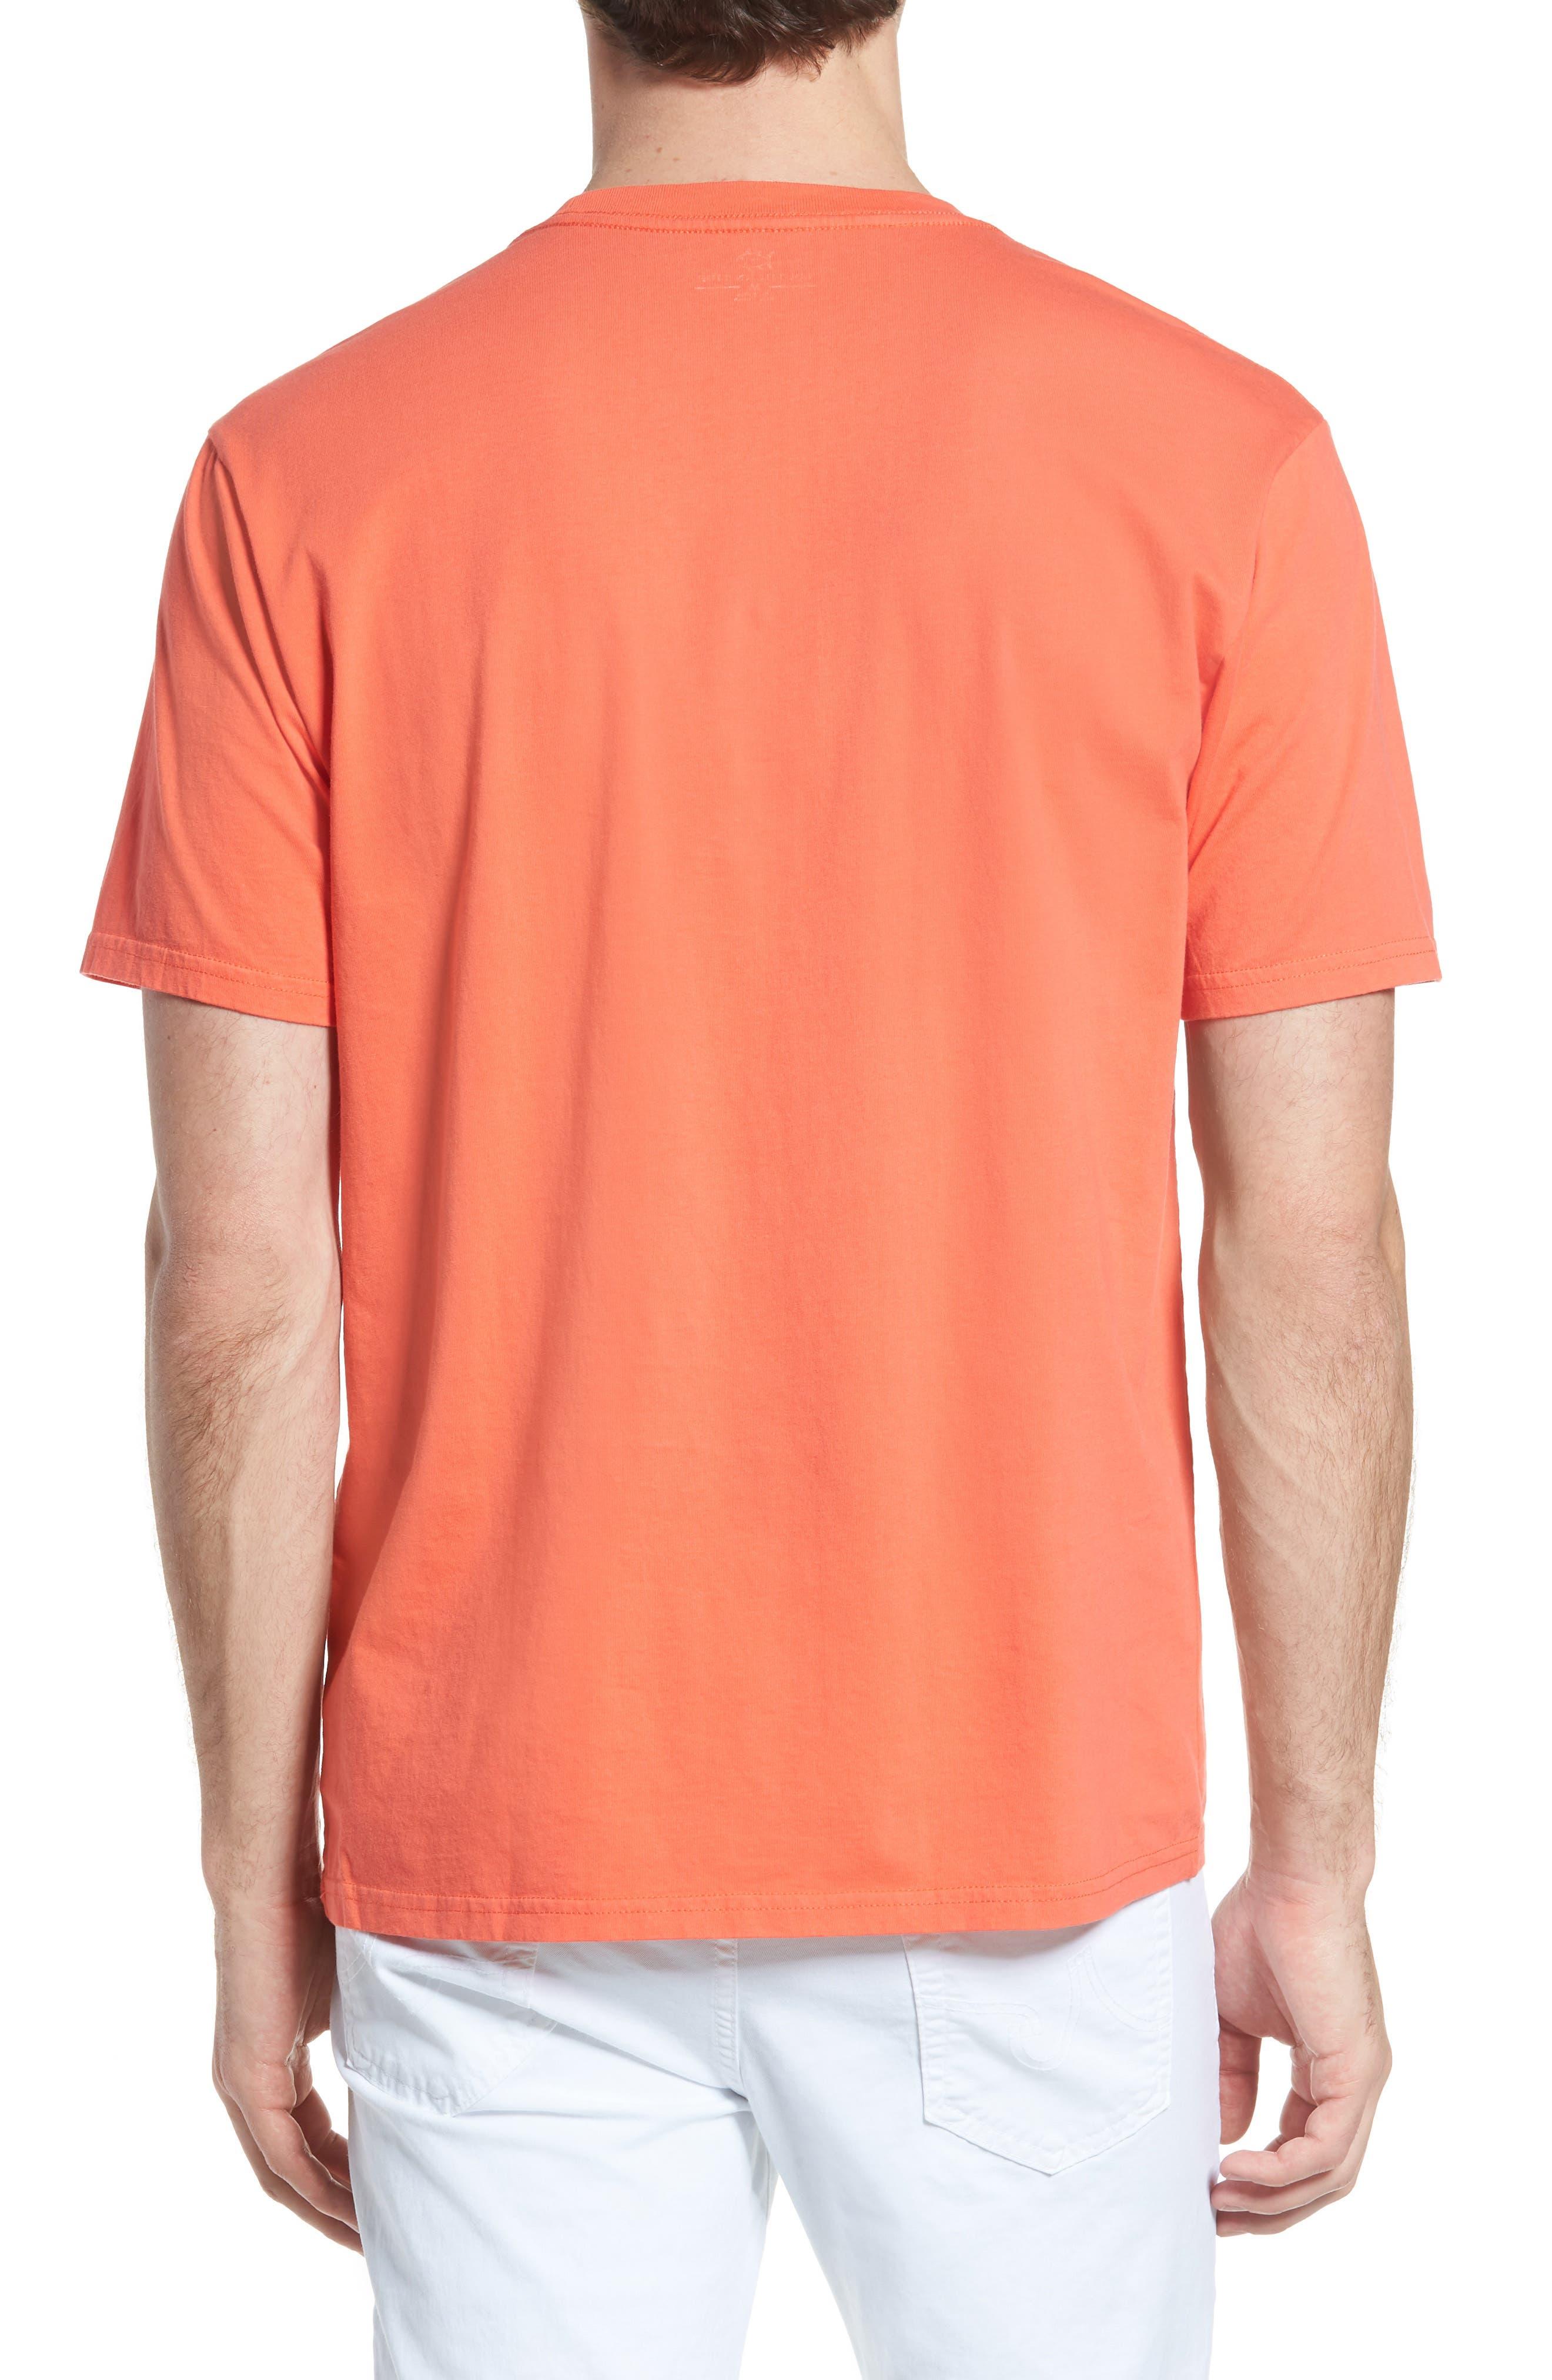 Skipjack Logo Regular Fit T-Shirt,                             Alternate thumbnail 2, color,                             Hot Coral